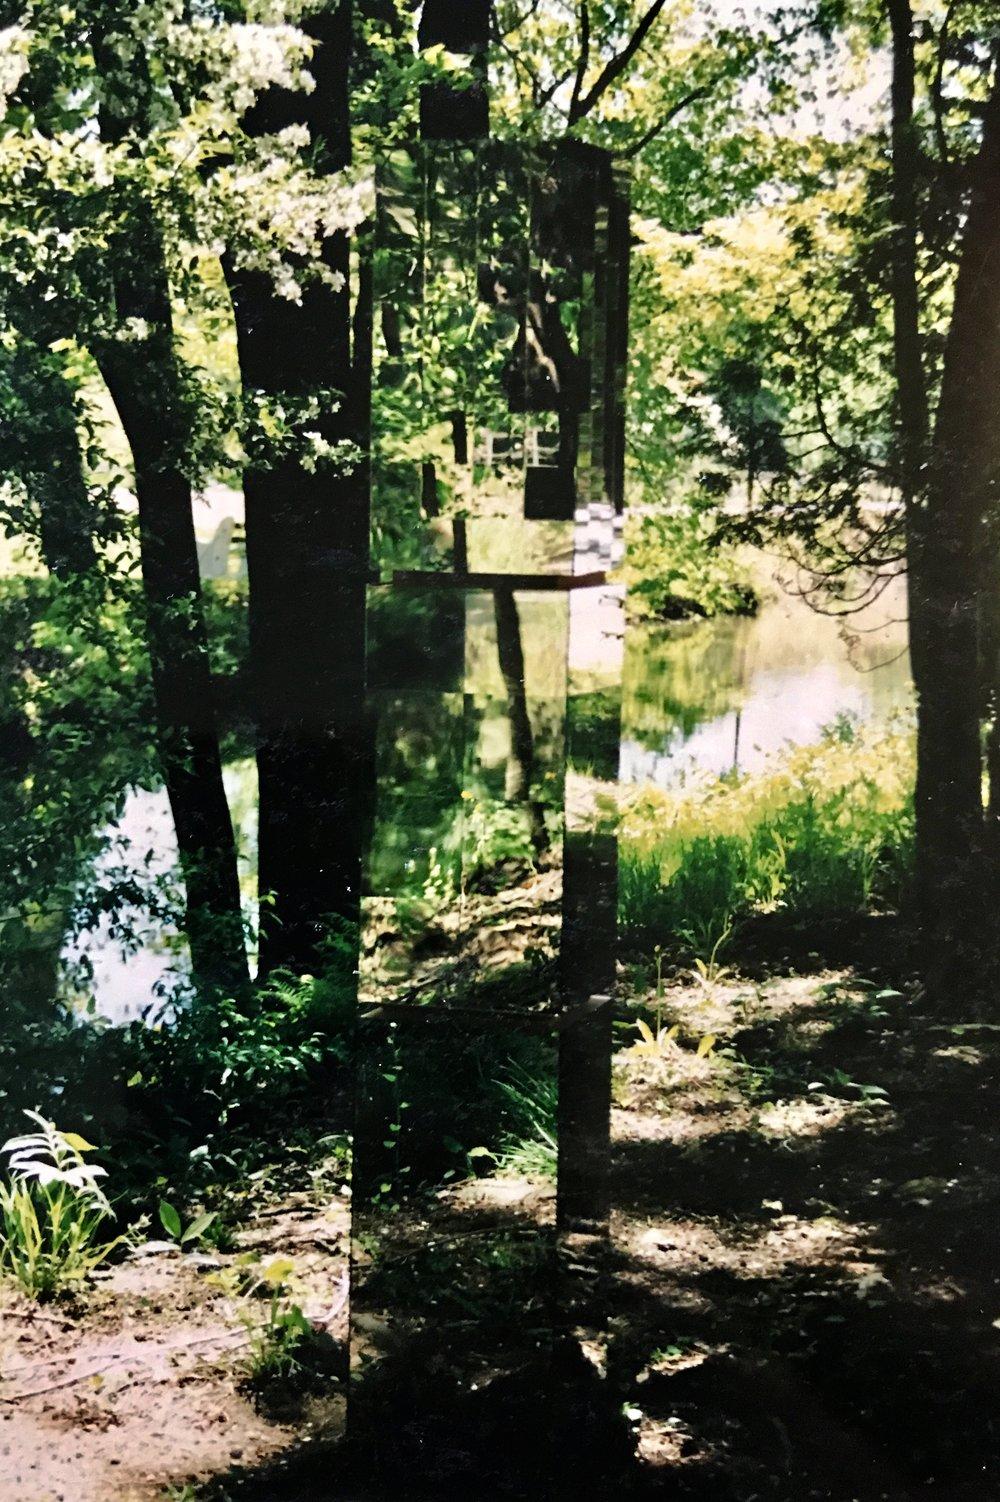 Natural Reflections 1'x1'x7'